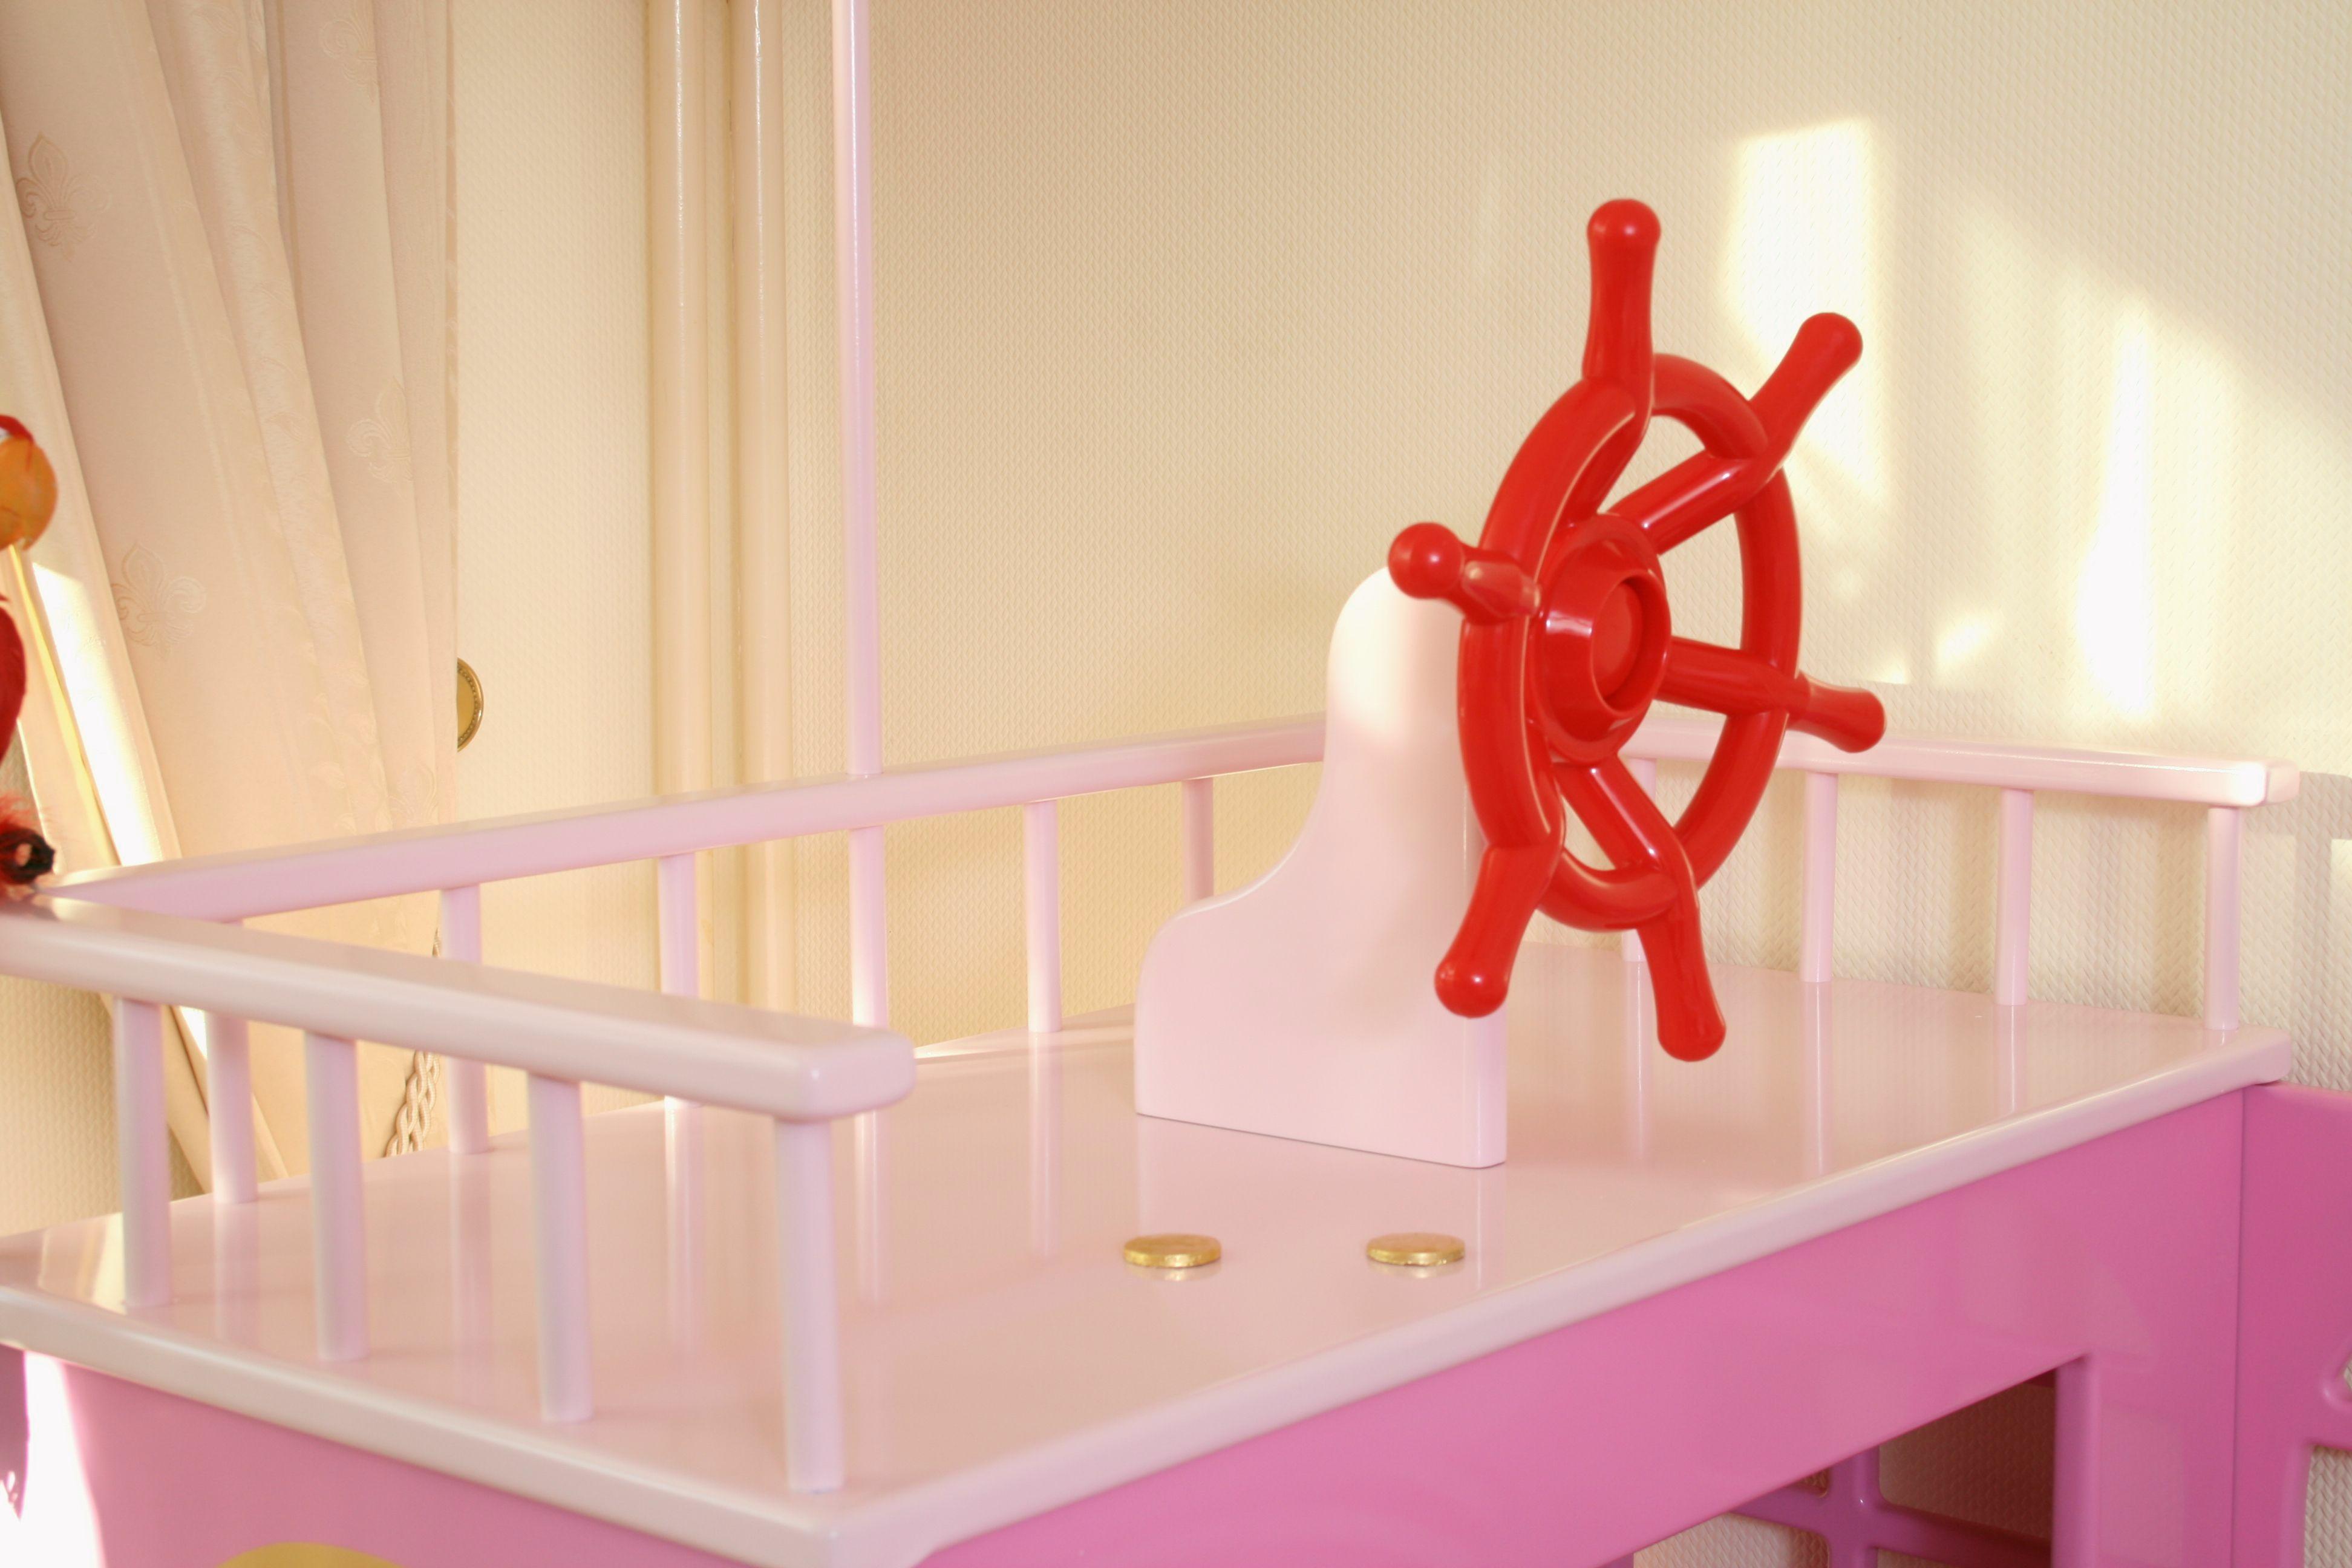 Etagenbett Piratenschiff : Kinderbett piratenschiff modisch neu